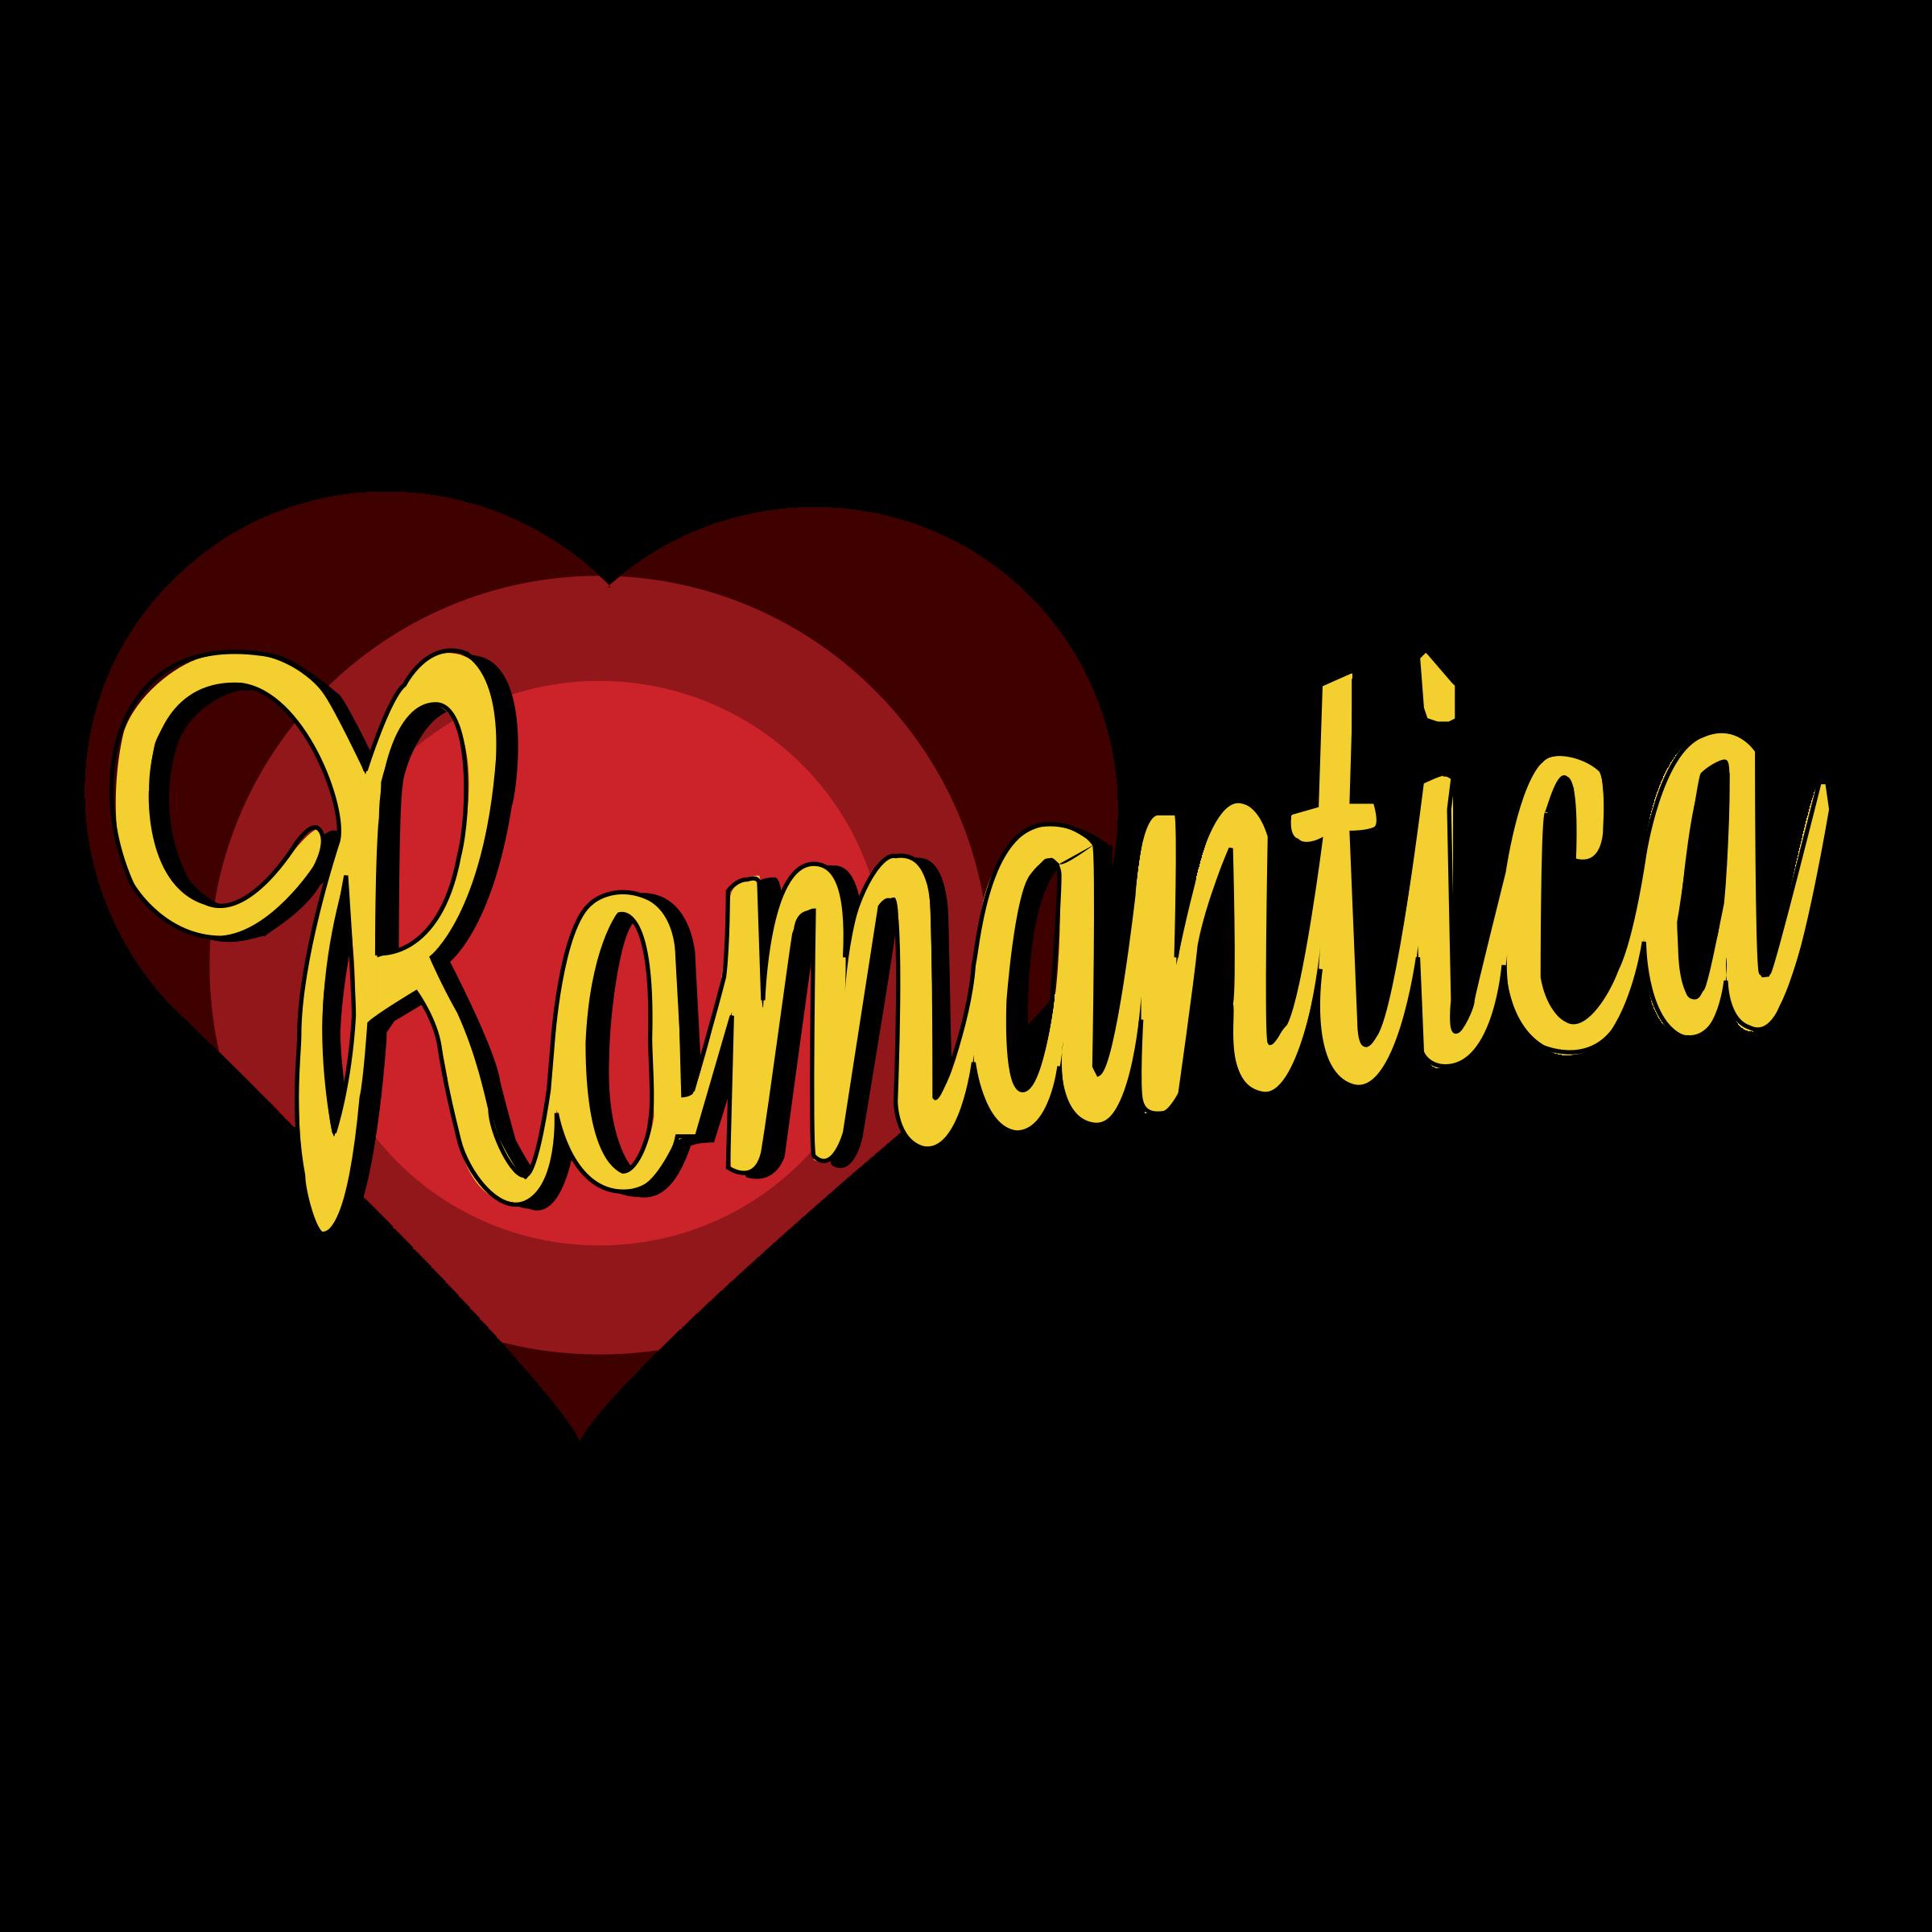 Appuntamento romantico clipart free clipart images gallery.